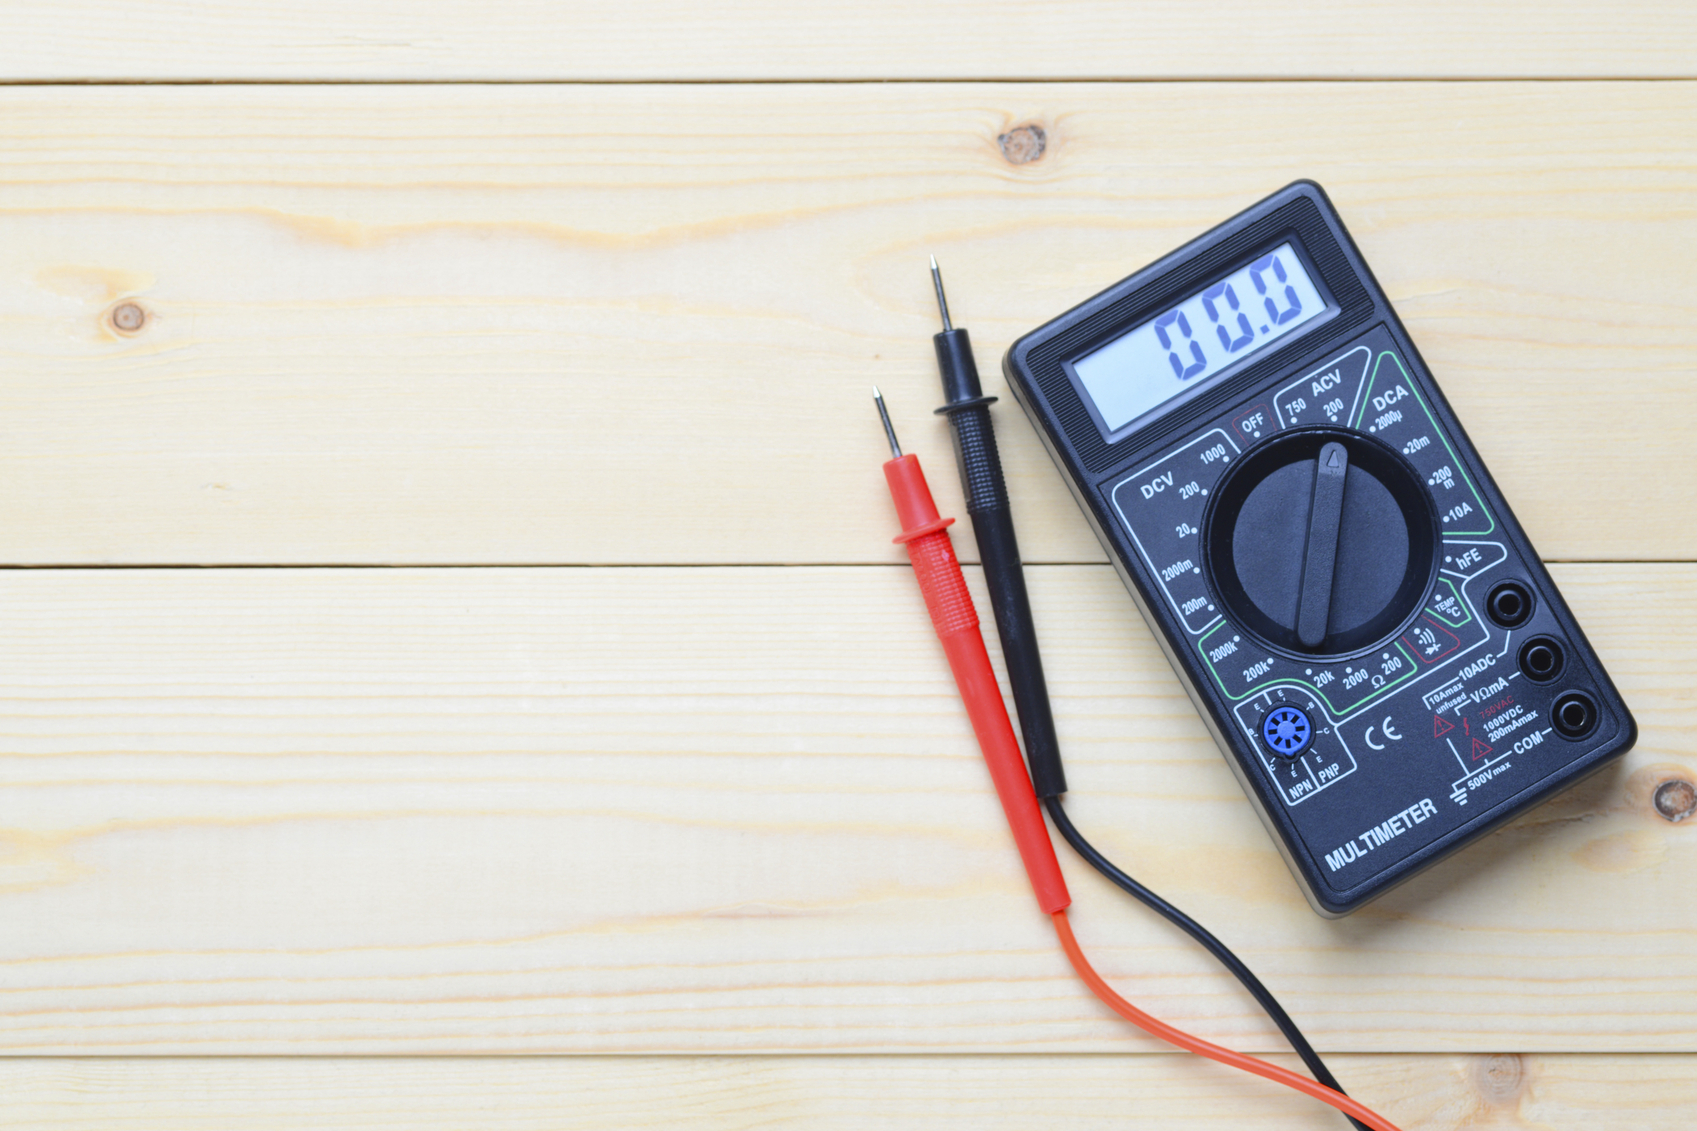 volt ampere watt bedeutung unterschied 11880. Black Bedroom Furniture Sets. Home Design Ideas